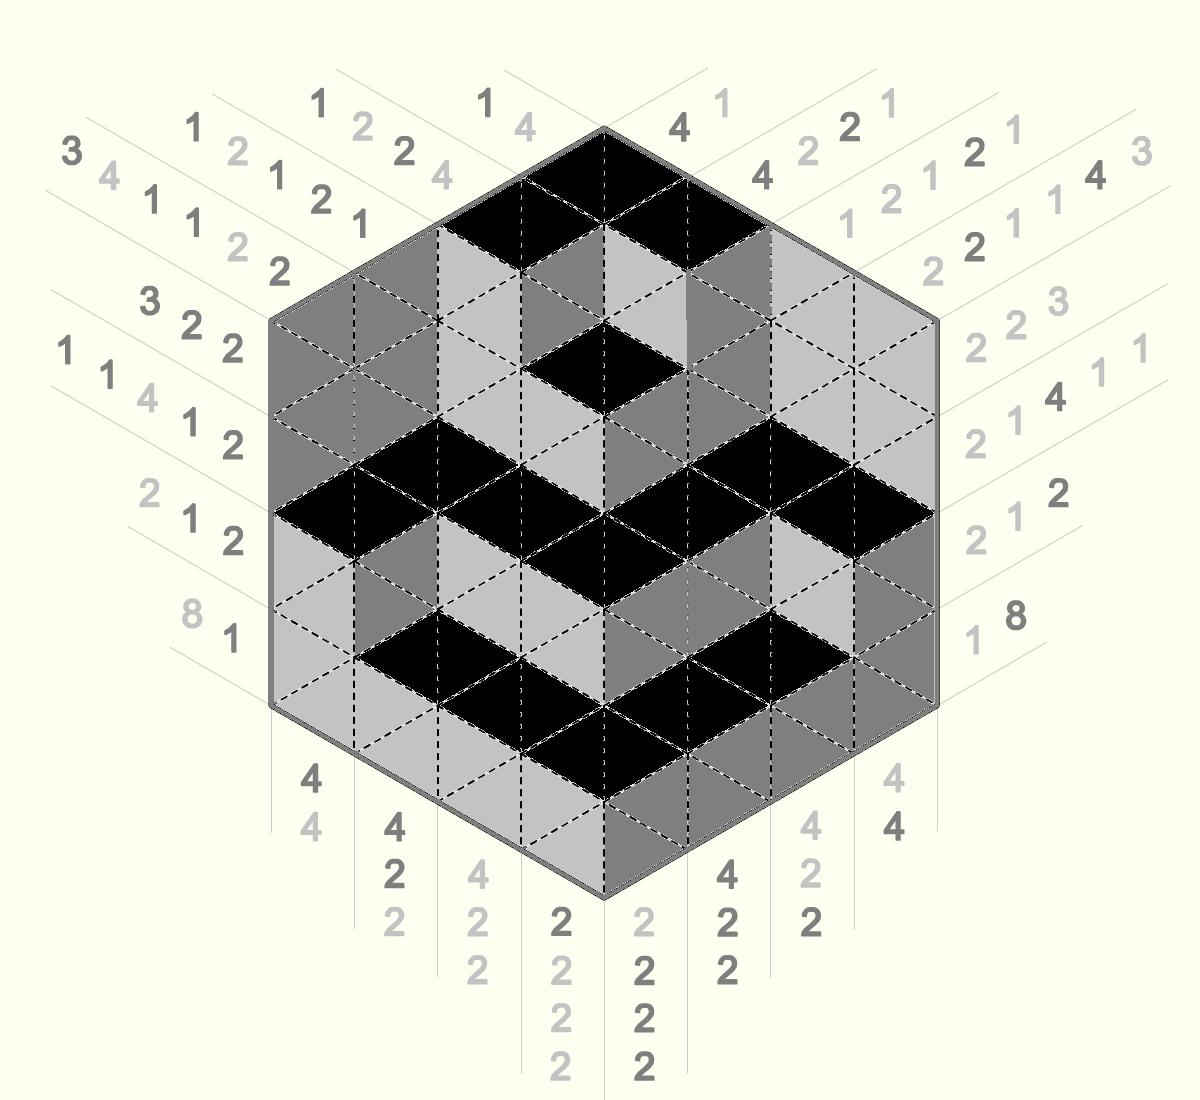 http://www.prise2tete.fr/upload/gwen27-frizjeu.png